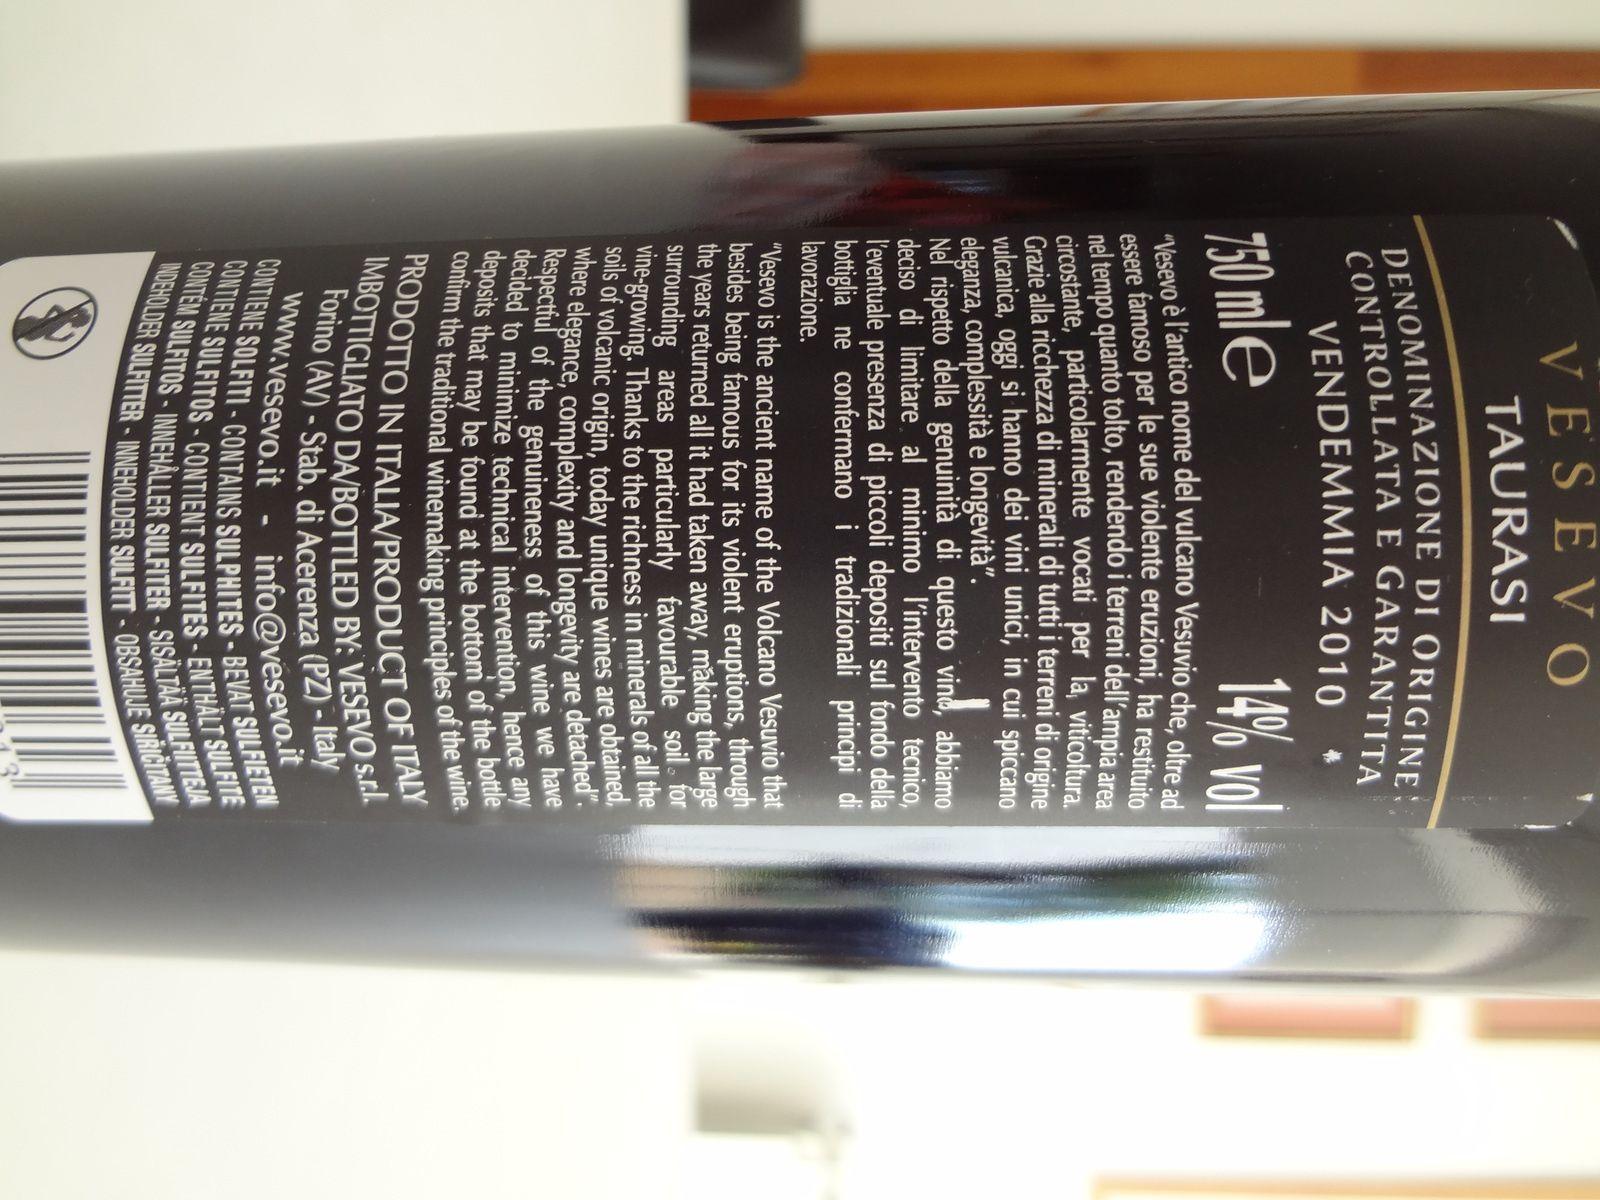 VINO PASSION - Dégustation vin DOCG Taurasi 2010.